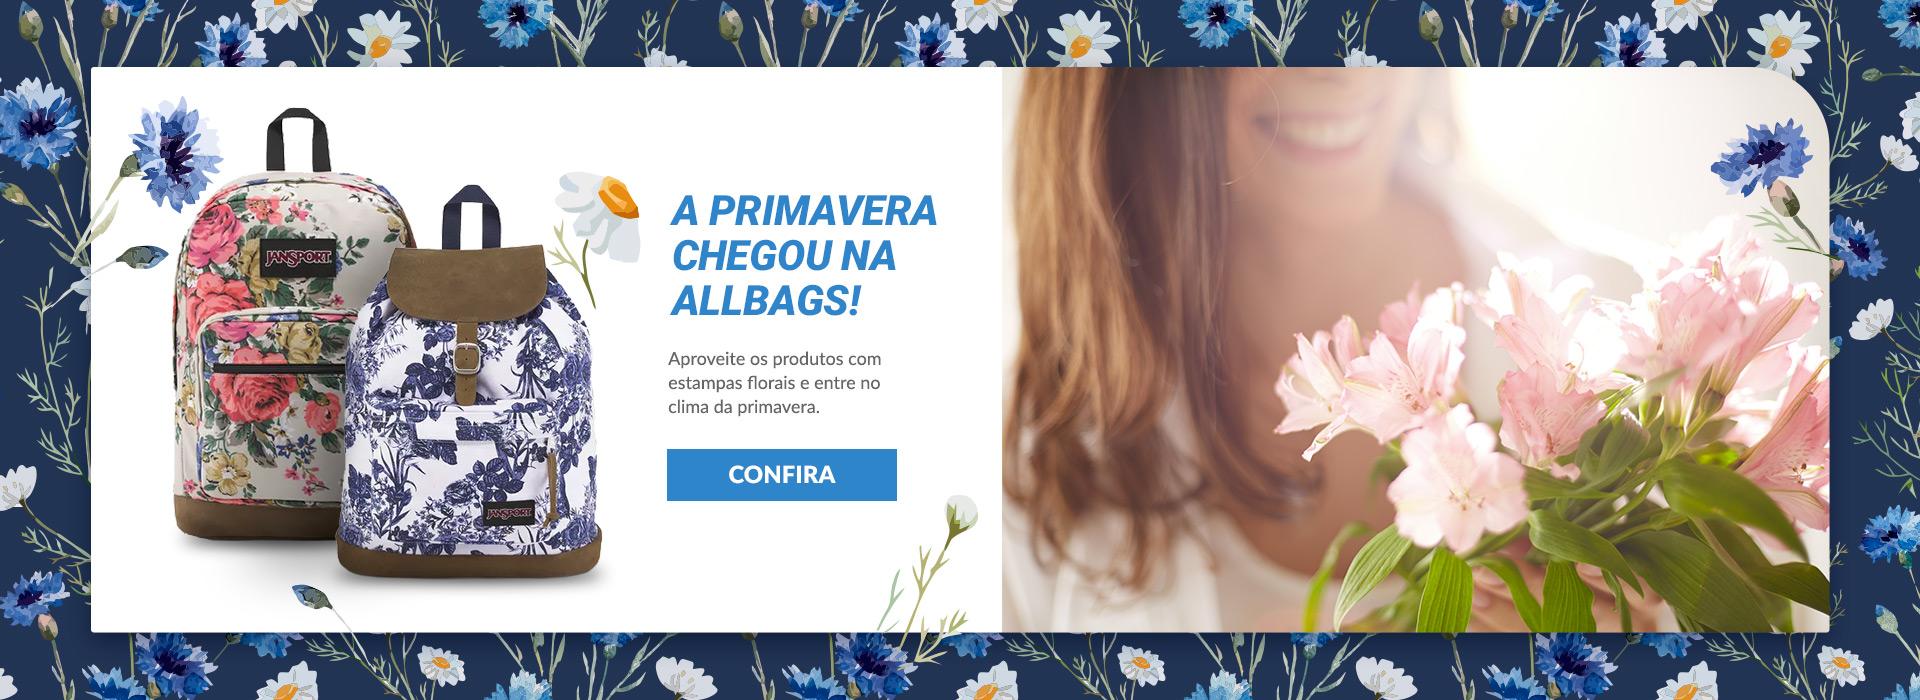 Banner 4 - PRIMAVERA